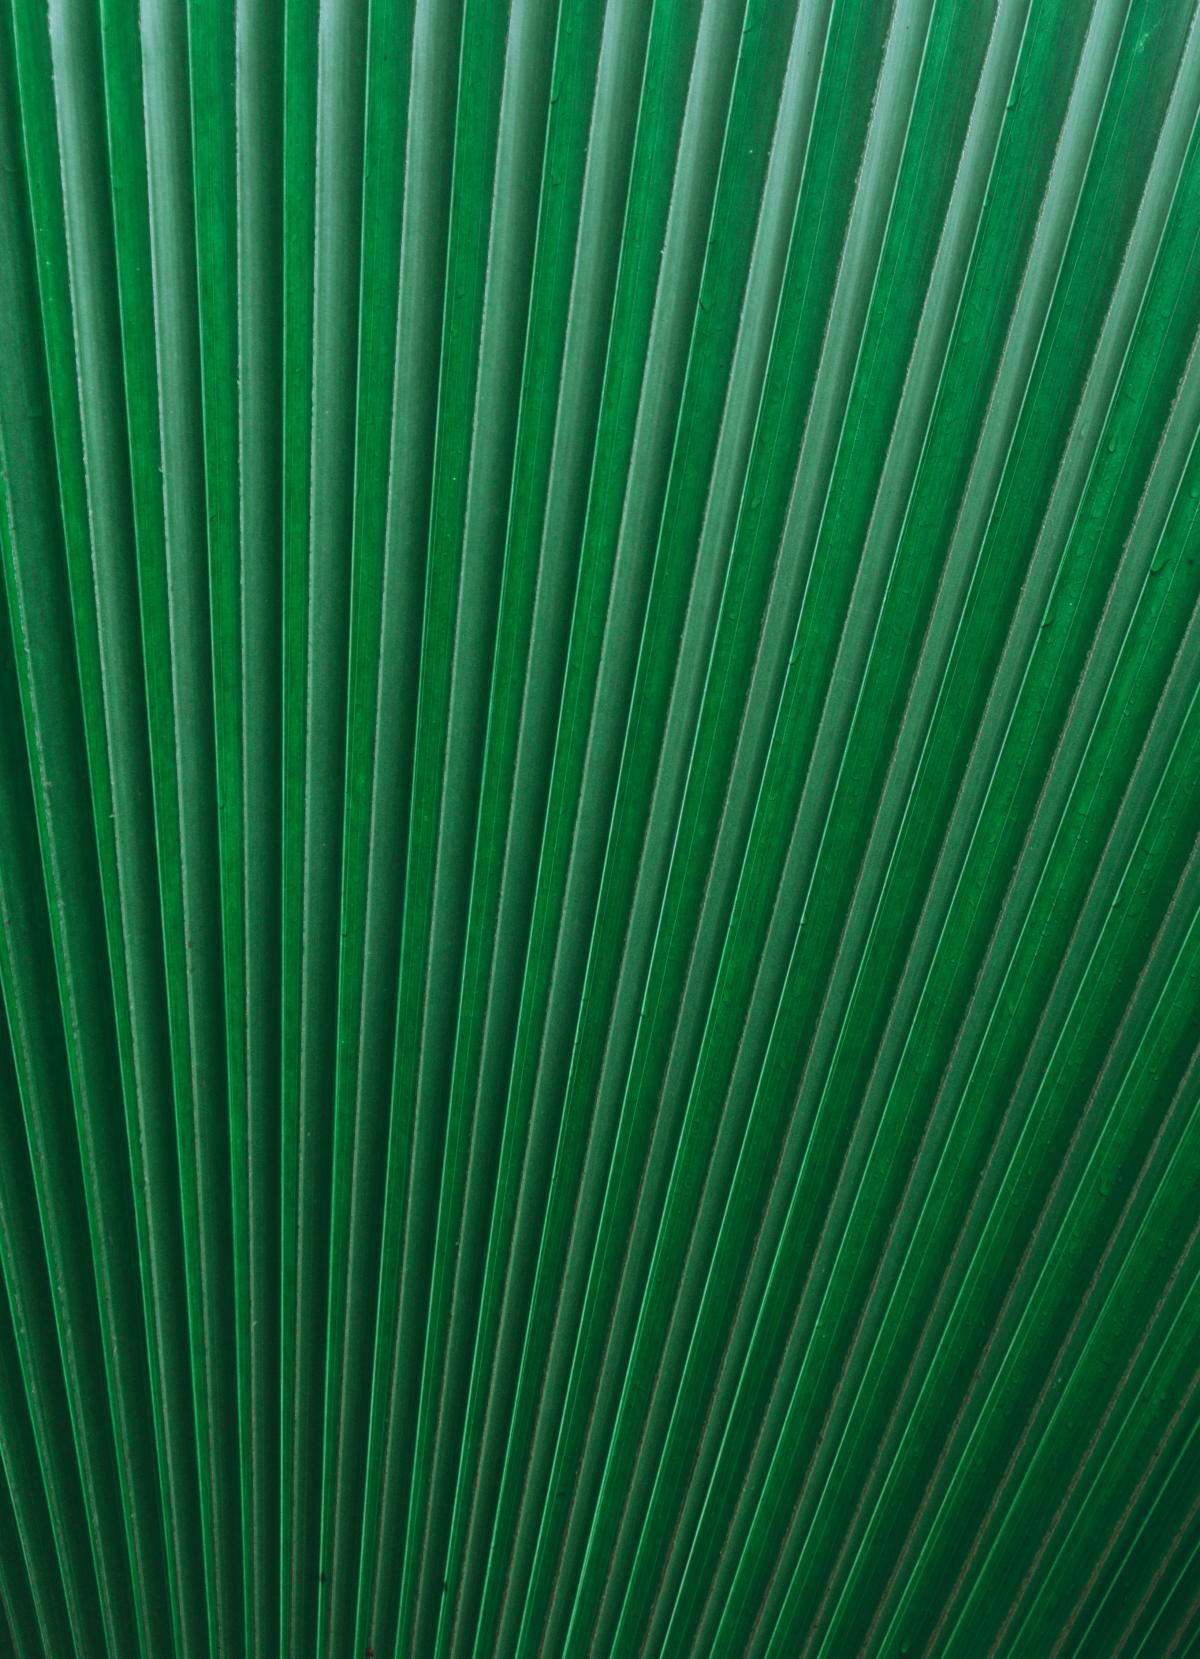 Texture Pattern Backdrop